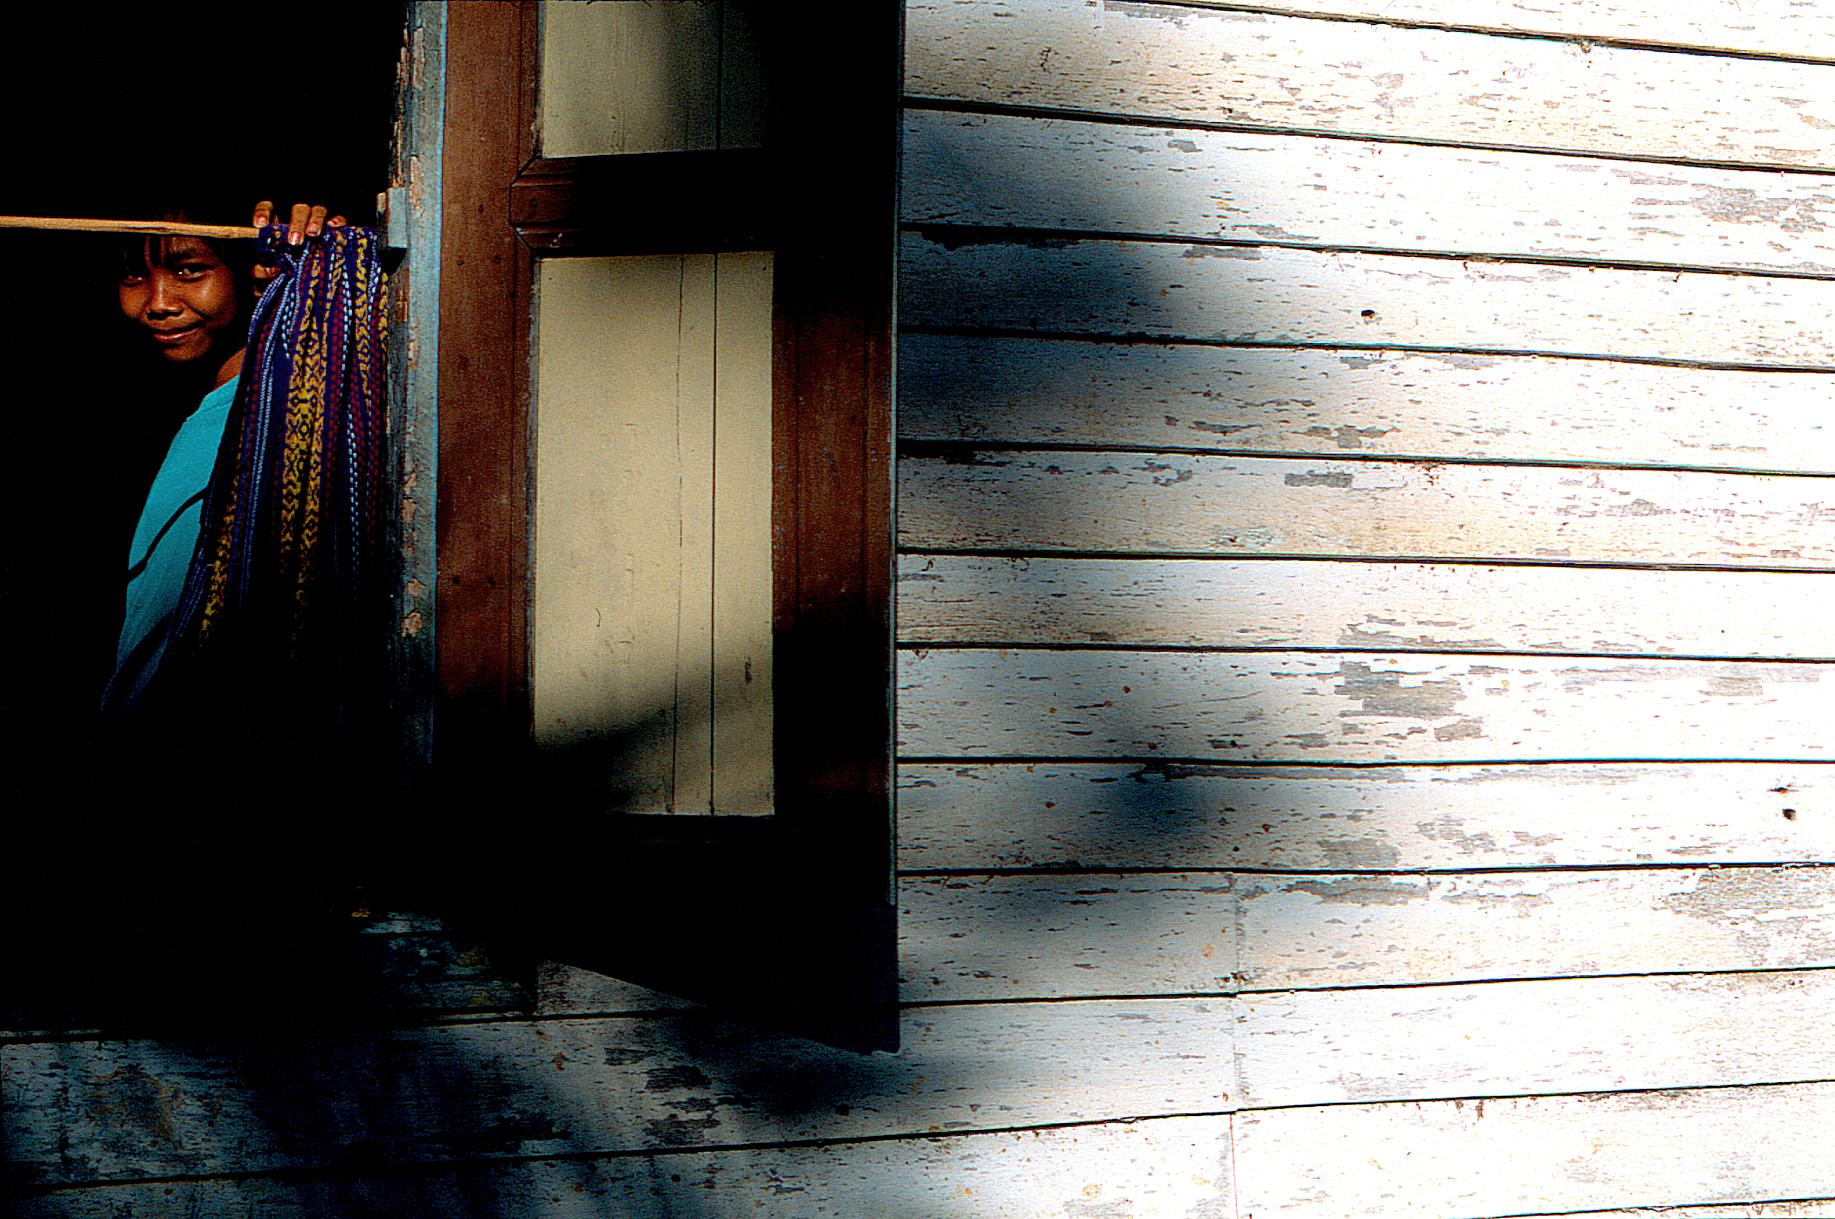 CT_012_Borneo Woman in Window.jpg